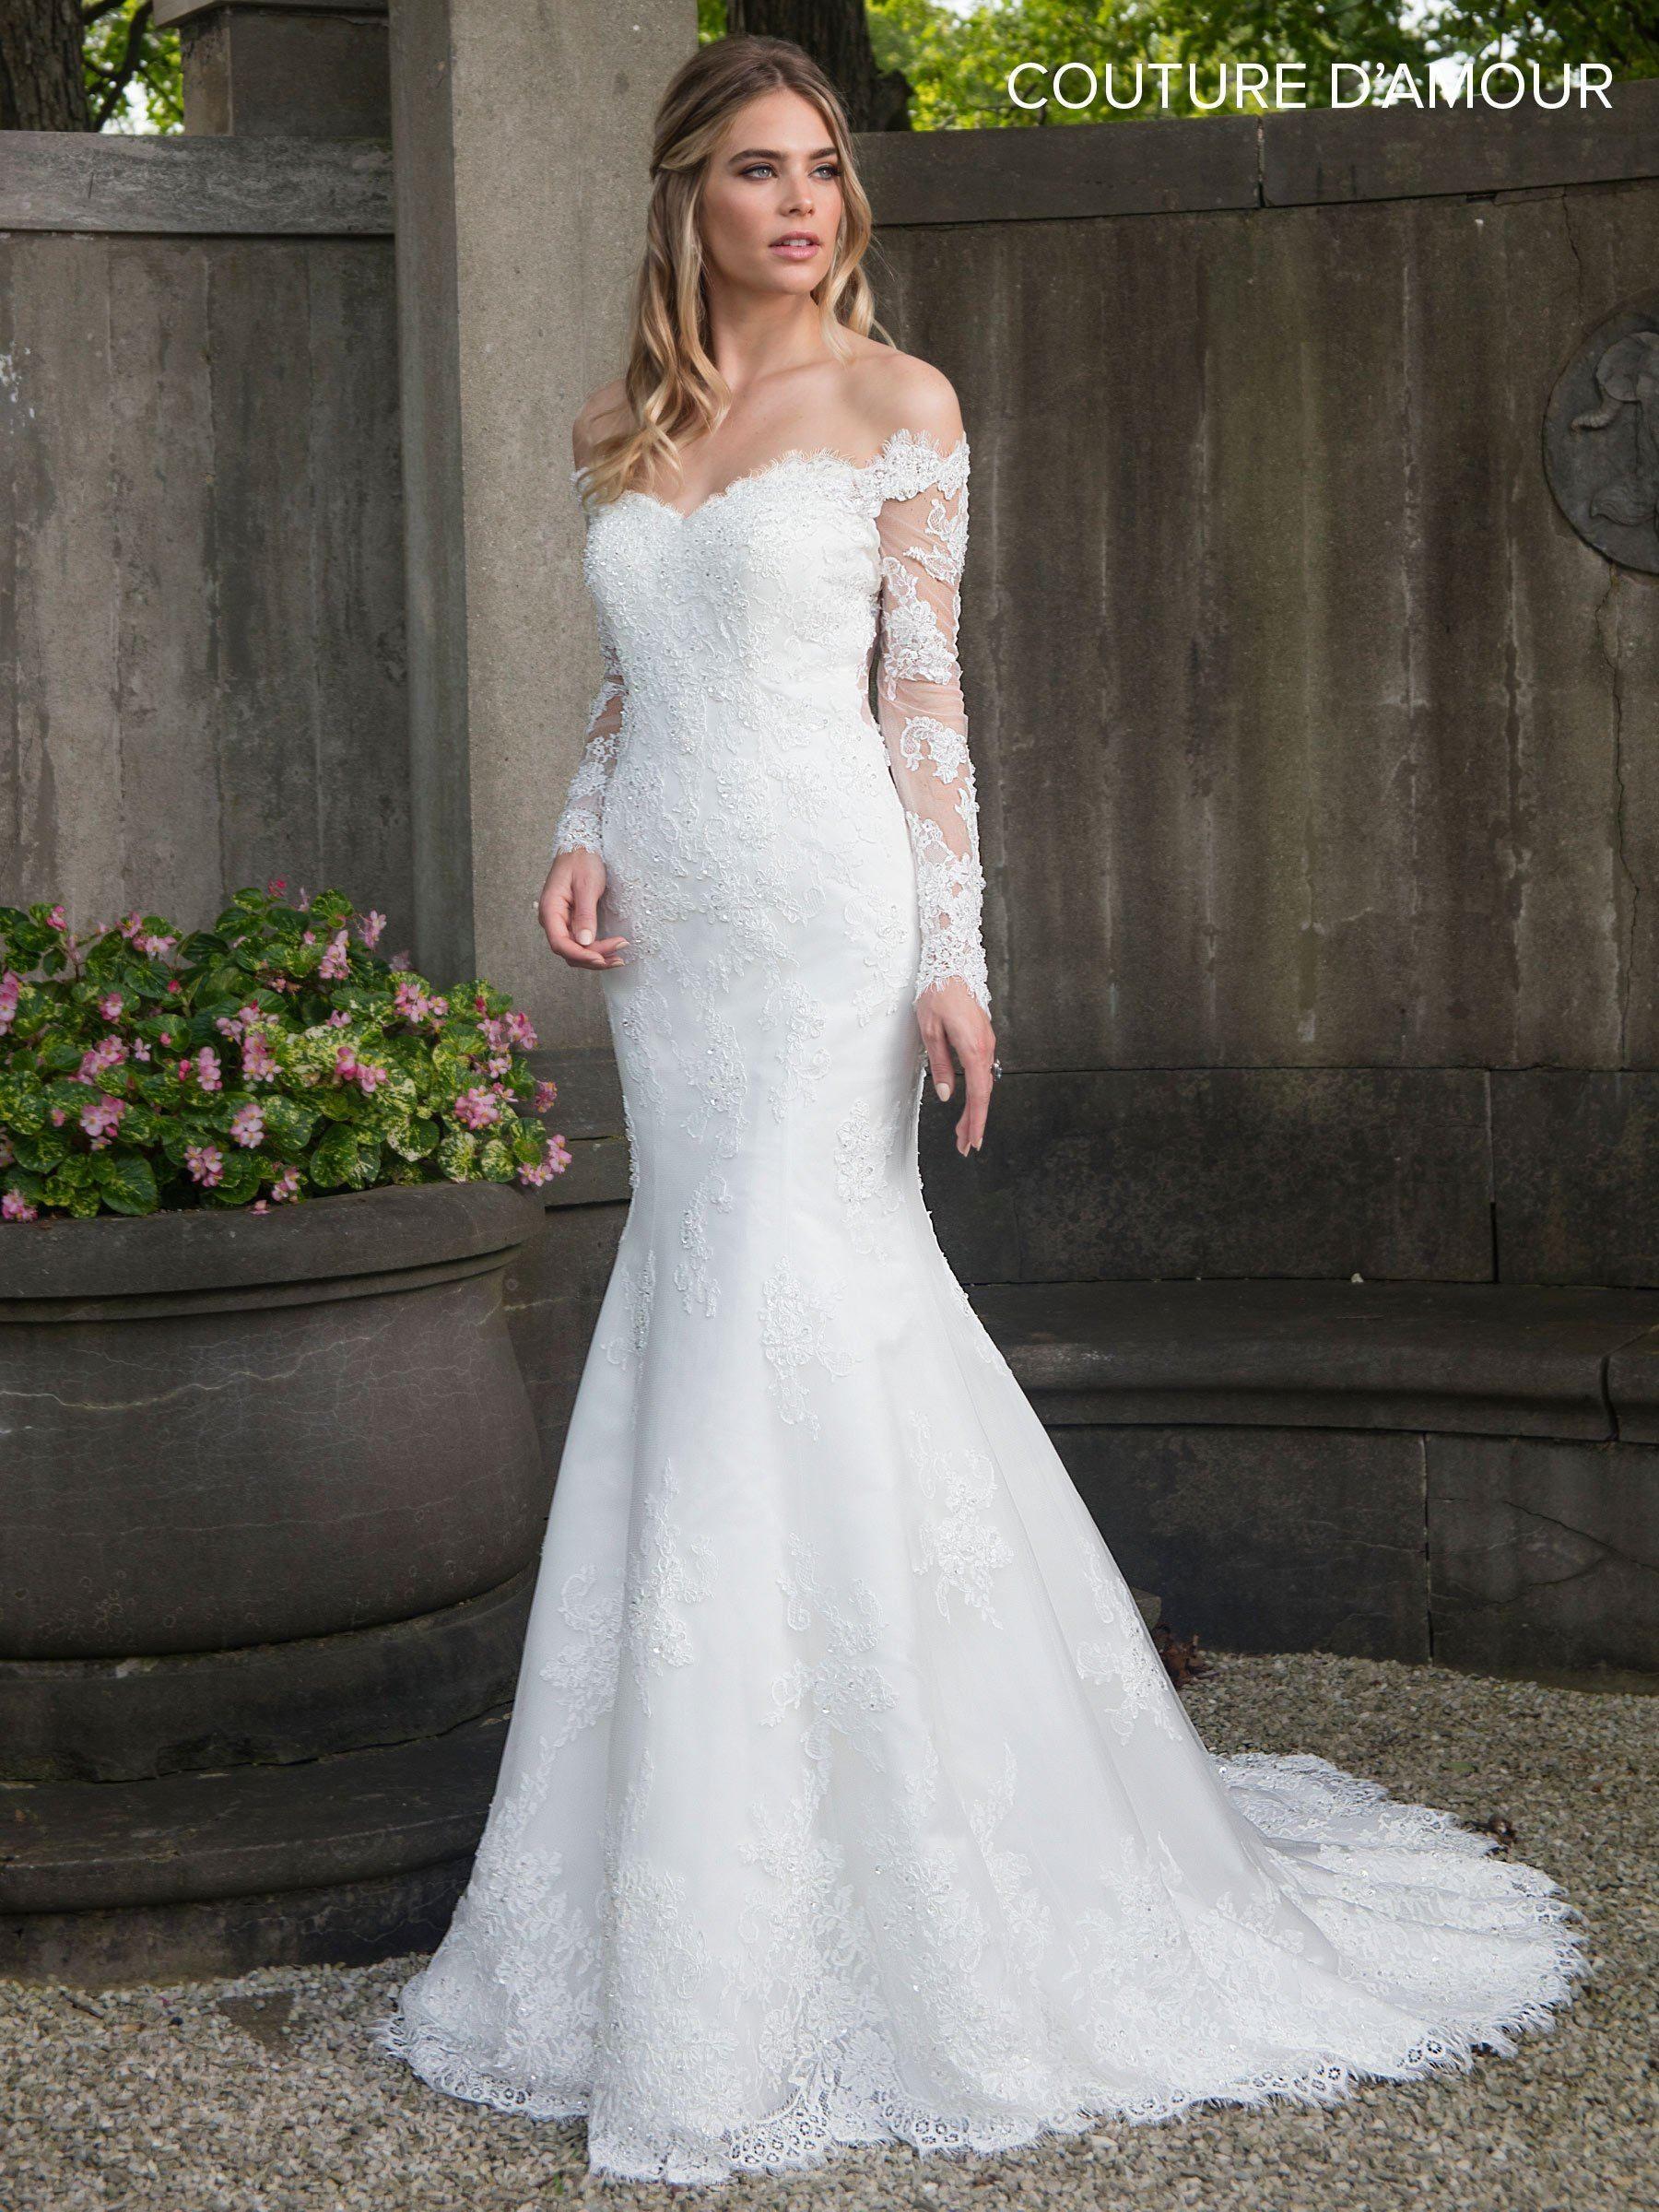 Off The Shoulder Mermaid Wedding Dress By Mary S Bridal Mb4009 In 2021 Wedding Dresses Trumpet Wedding Dress Bridal Dresses [ 2400 x 1800 Pixel ]